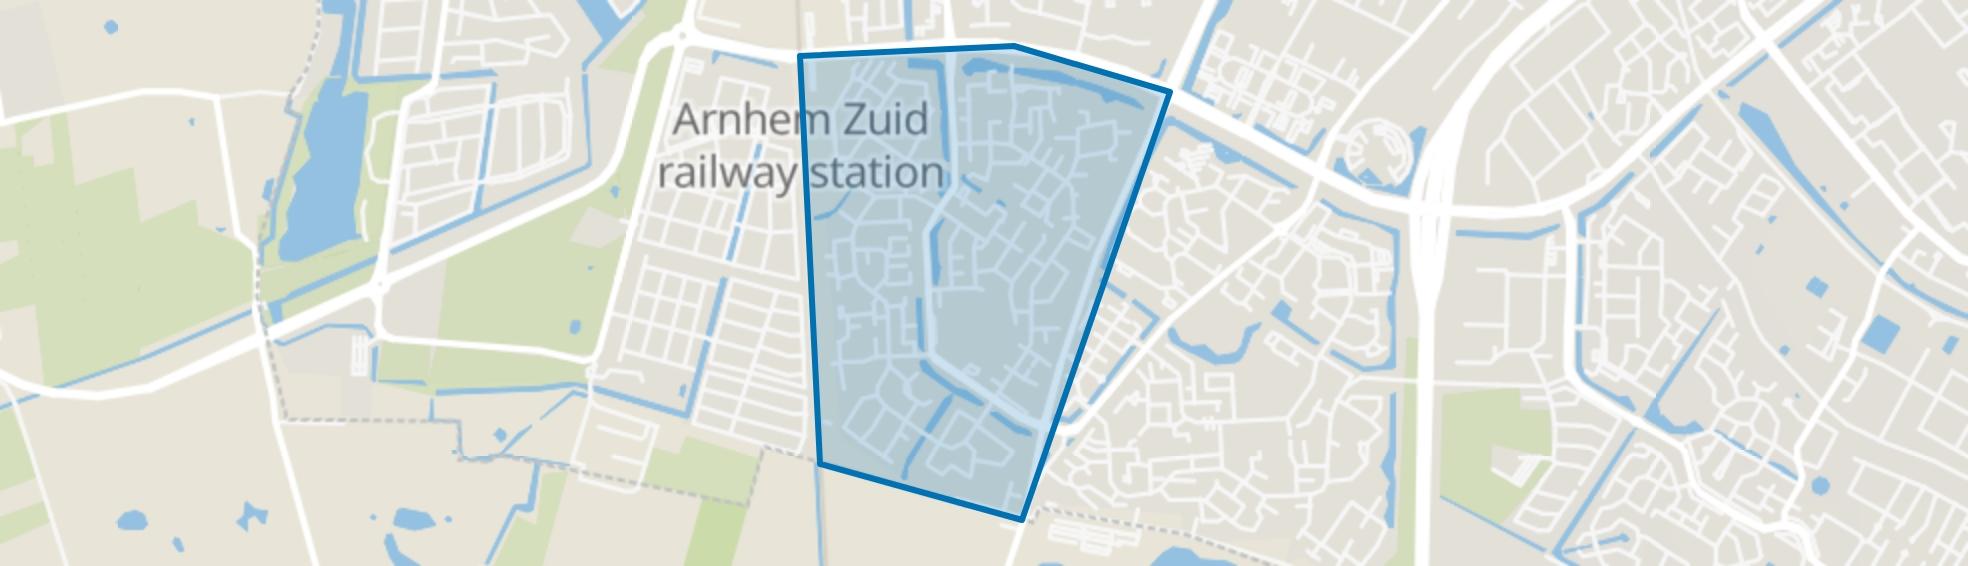 De Laar-West, Arnhem map